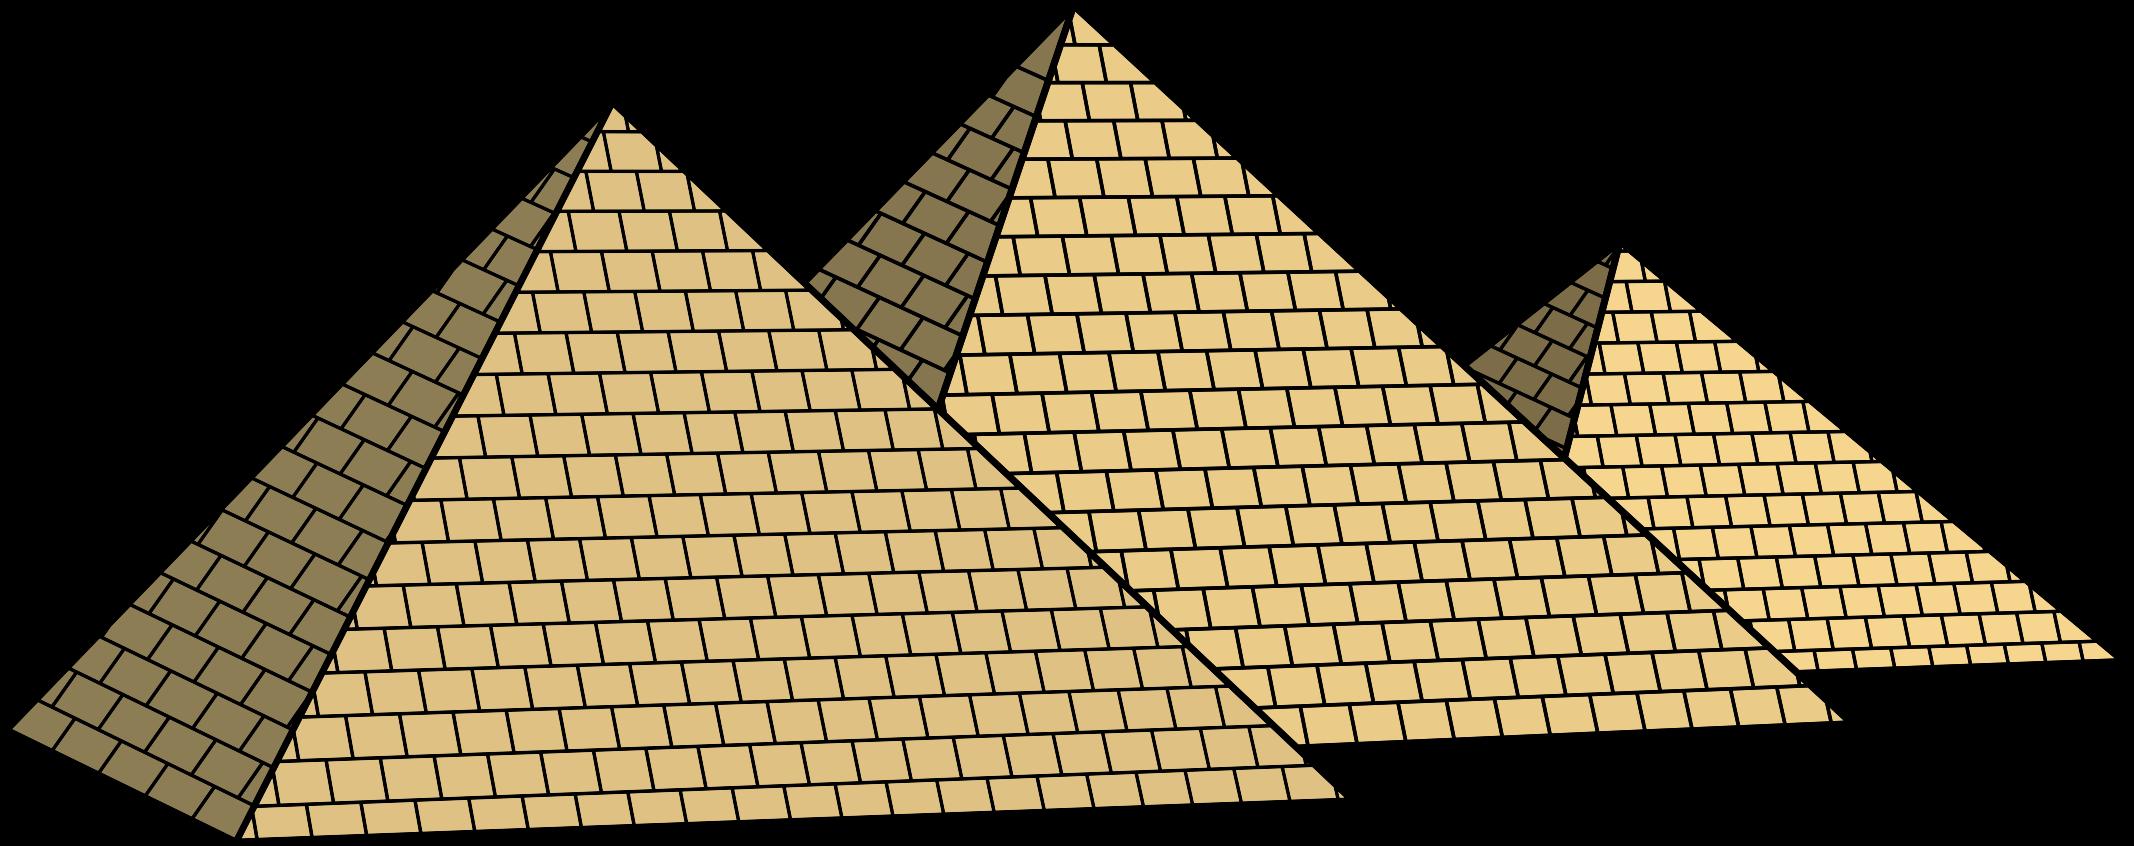 Egypt clipart triangle pyramid. Egyptian pyramids big image